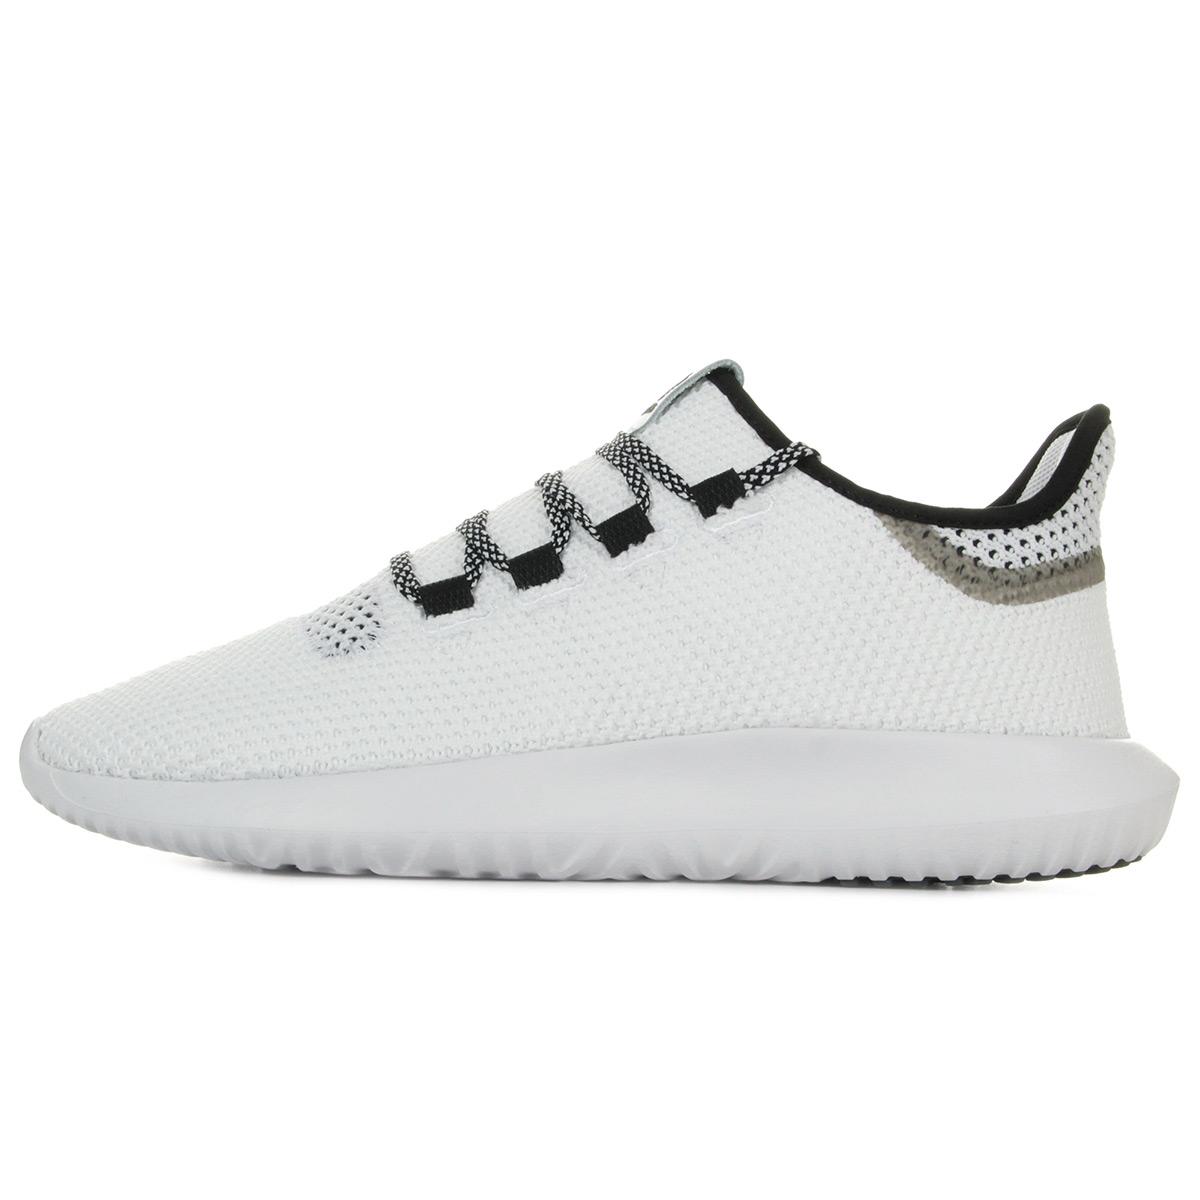 adidas Tubular Shadow Ck CQ0929, Baskets mode homme